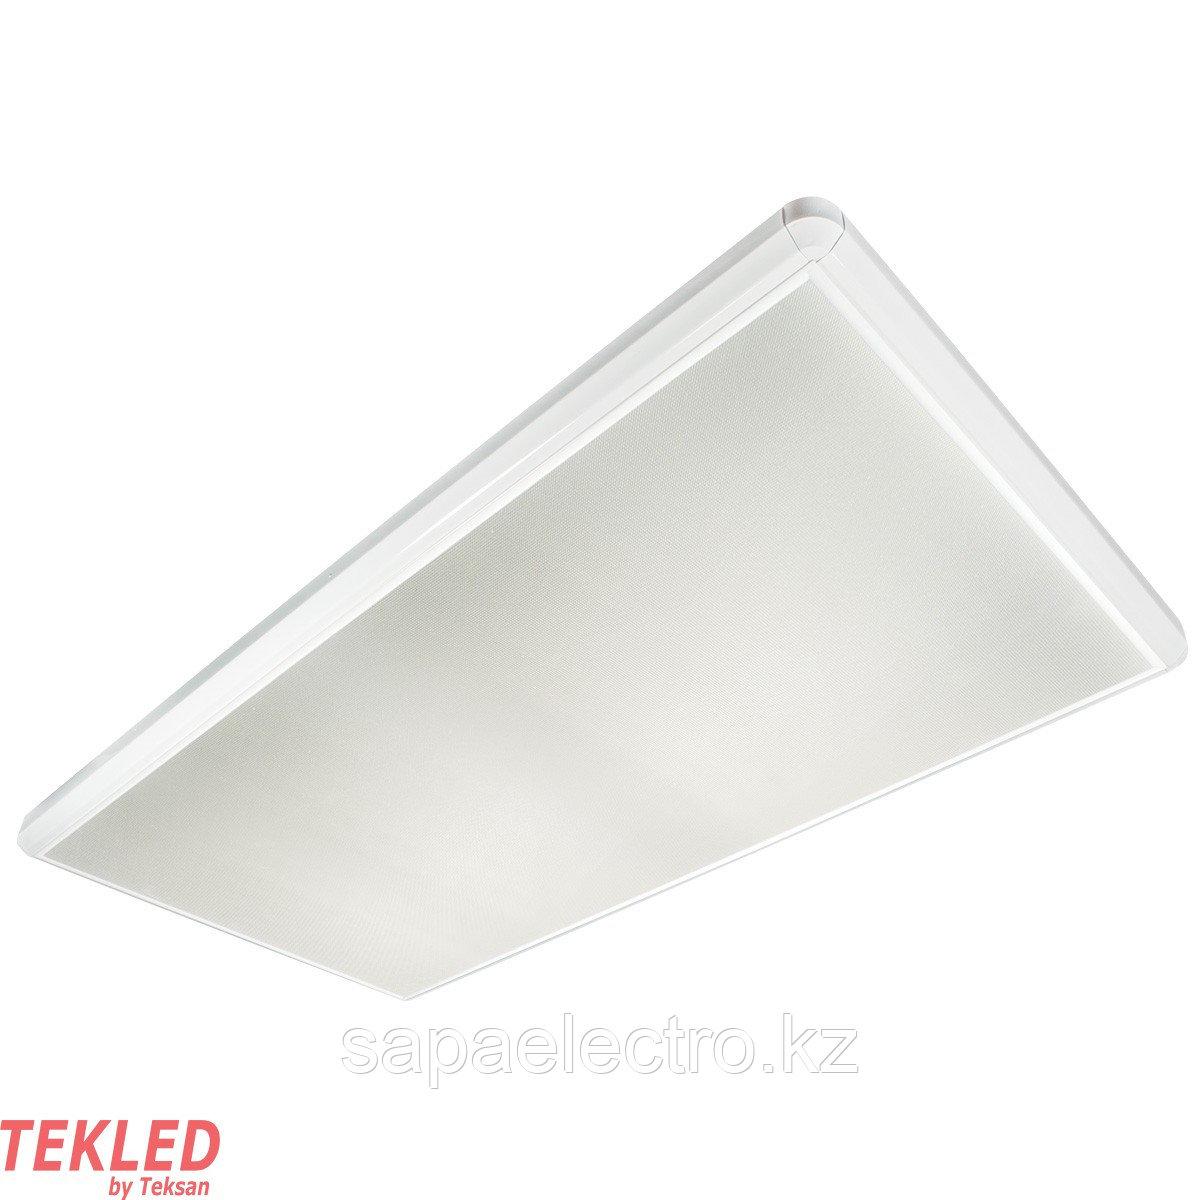 Св-к PINSPOTLED 16X9W/LZN 436 накл-й MEGALUX